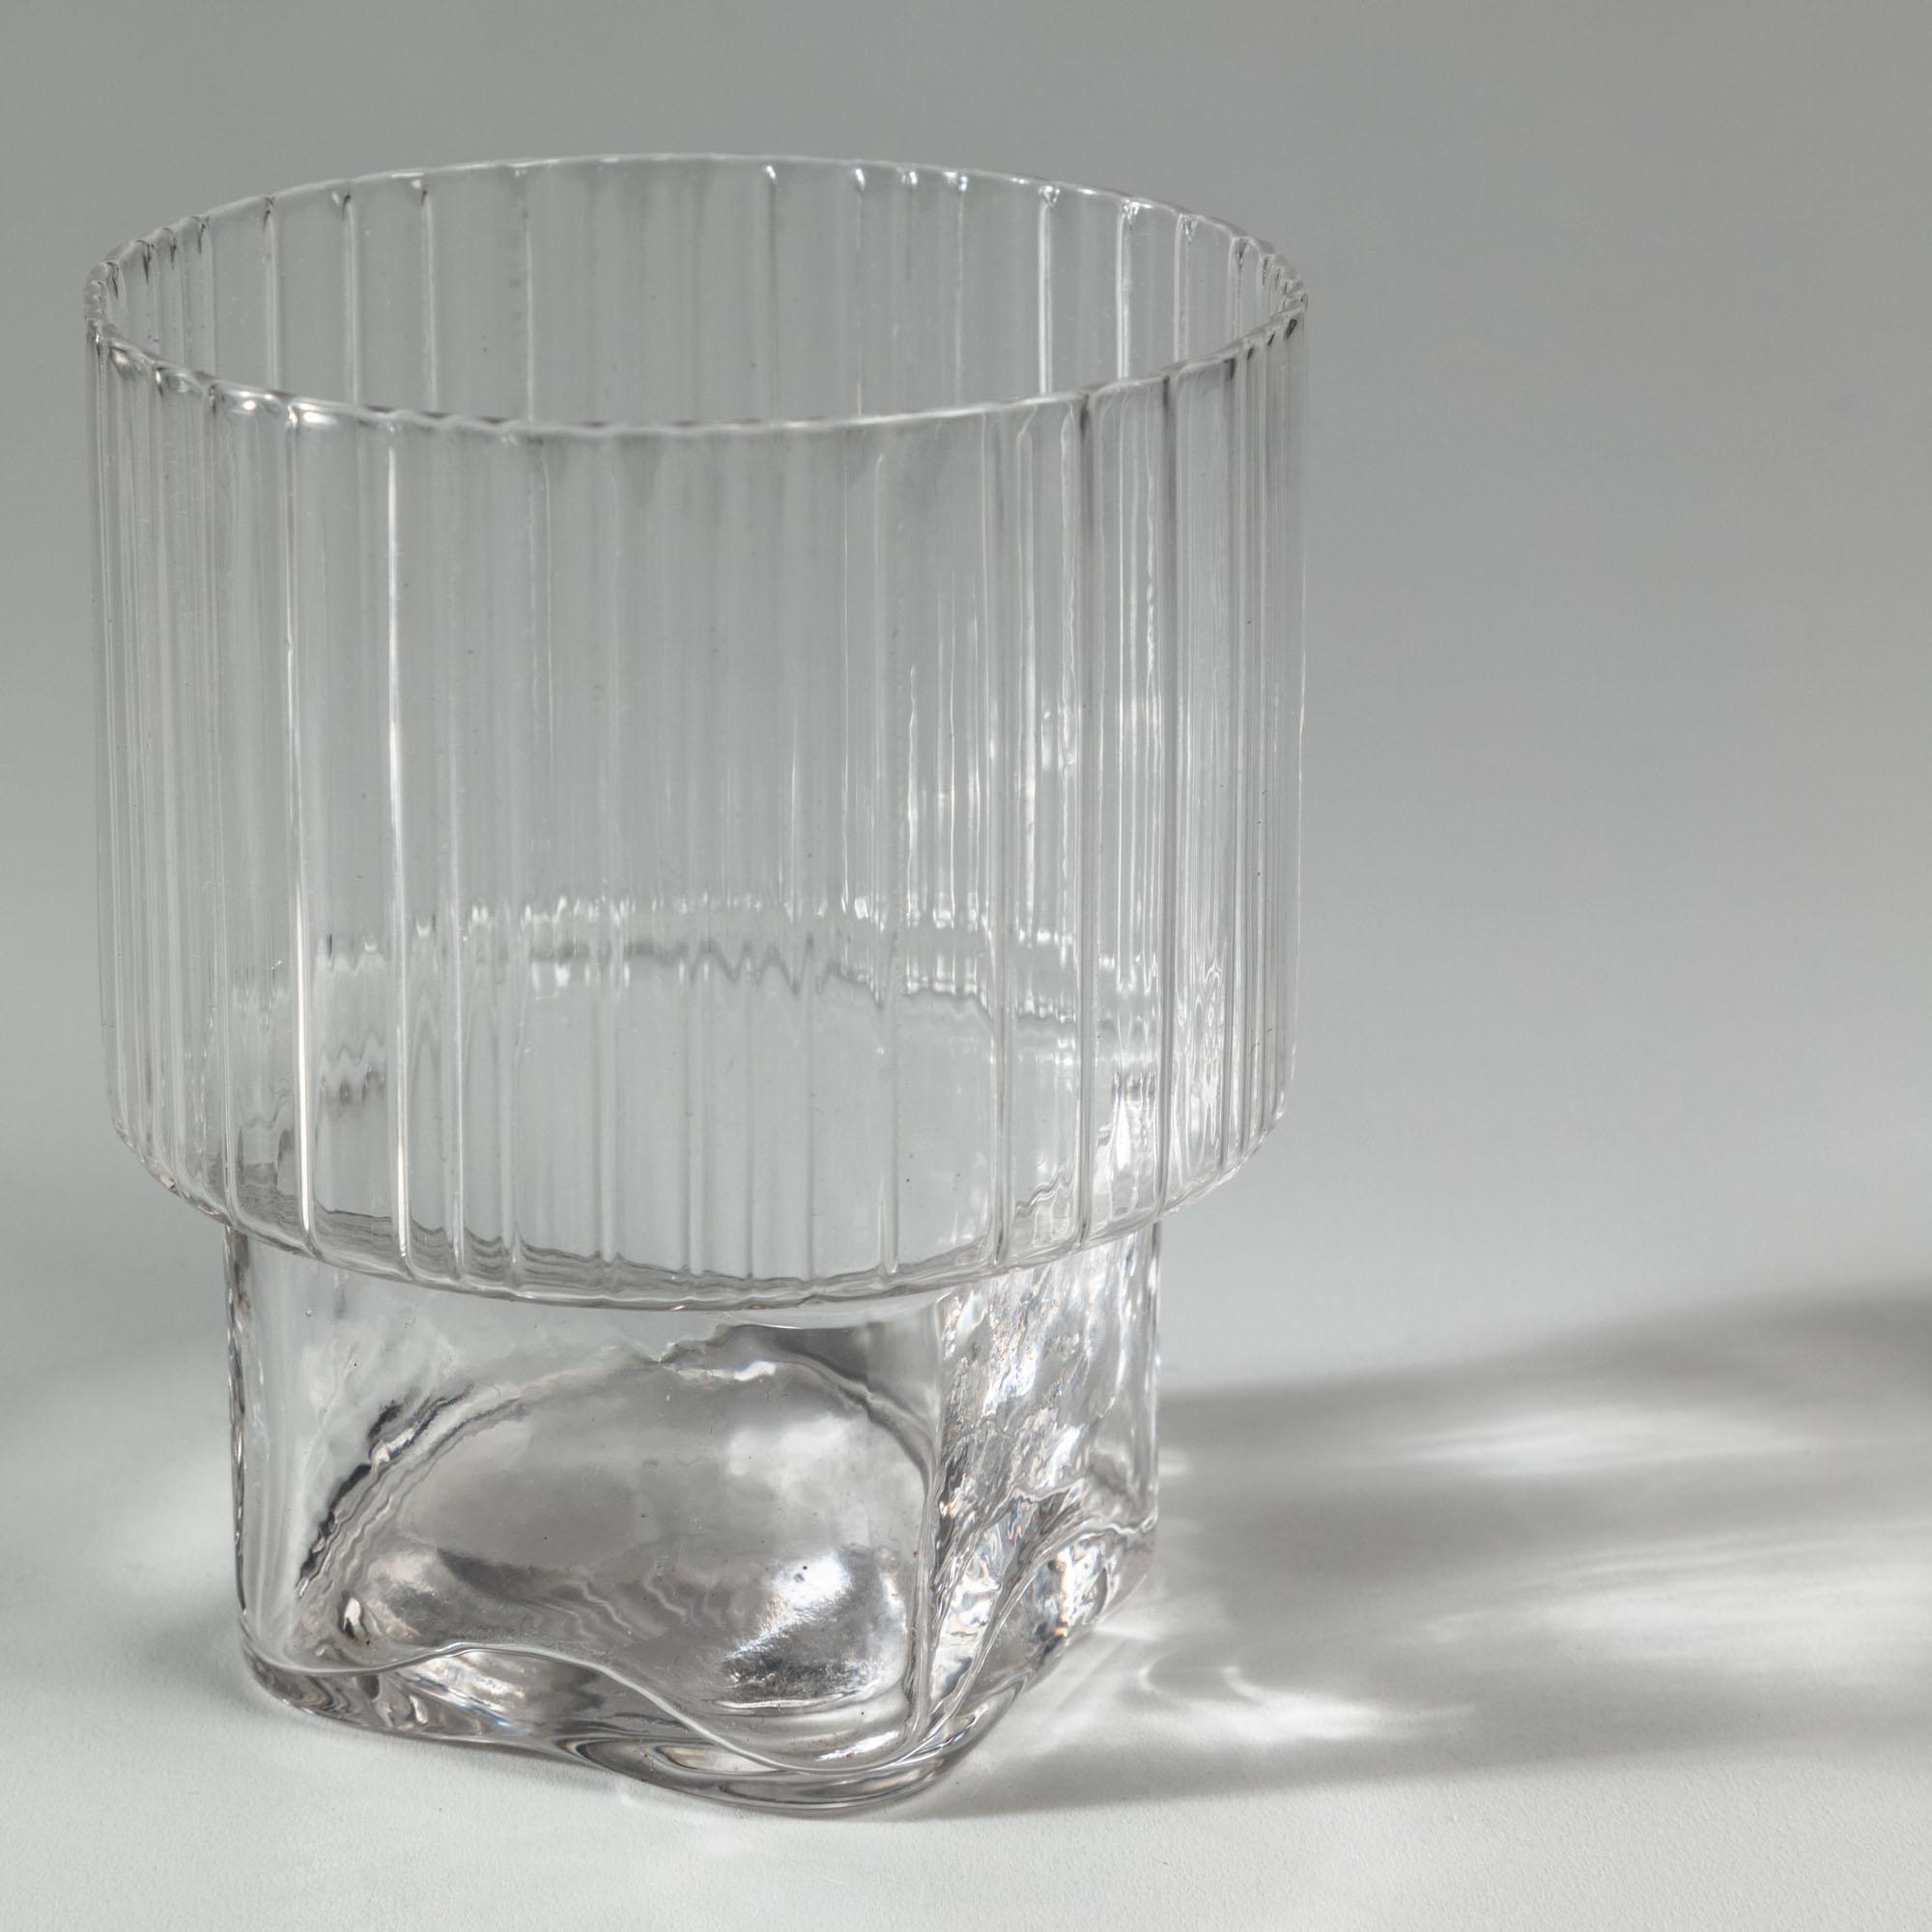 Glas Sheli